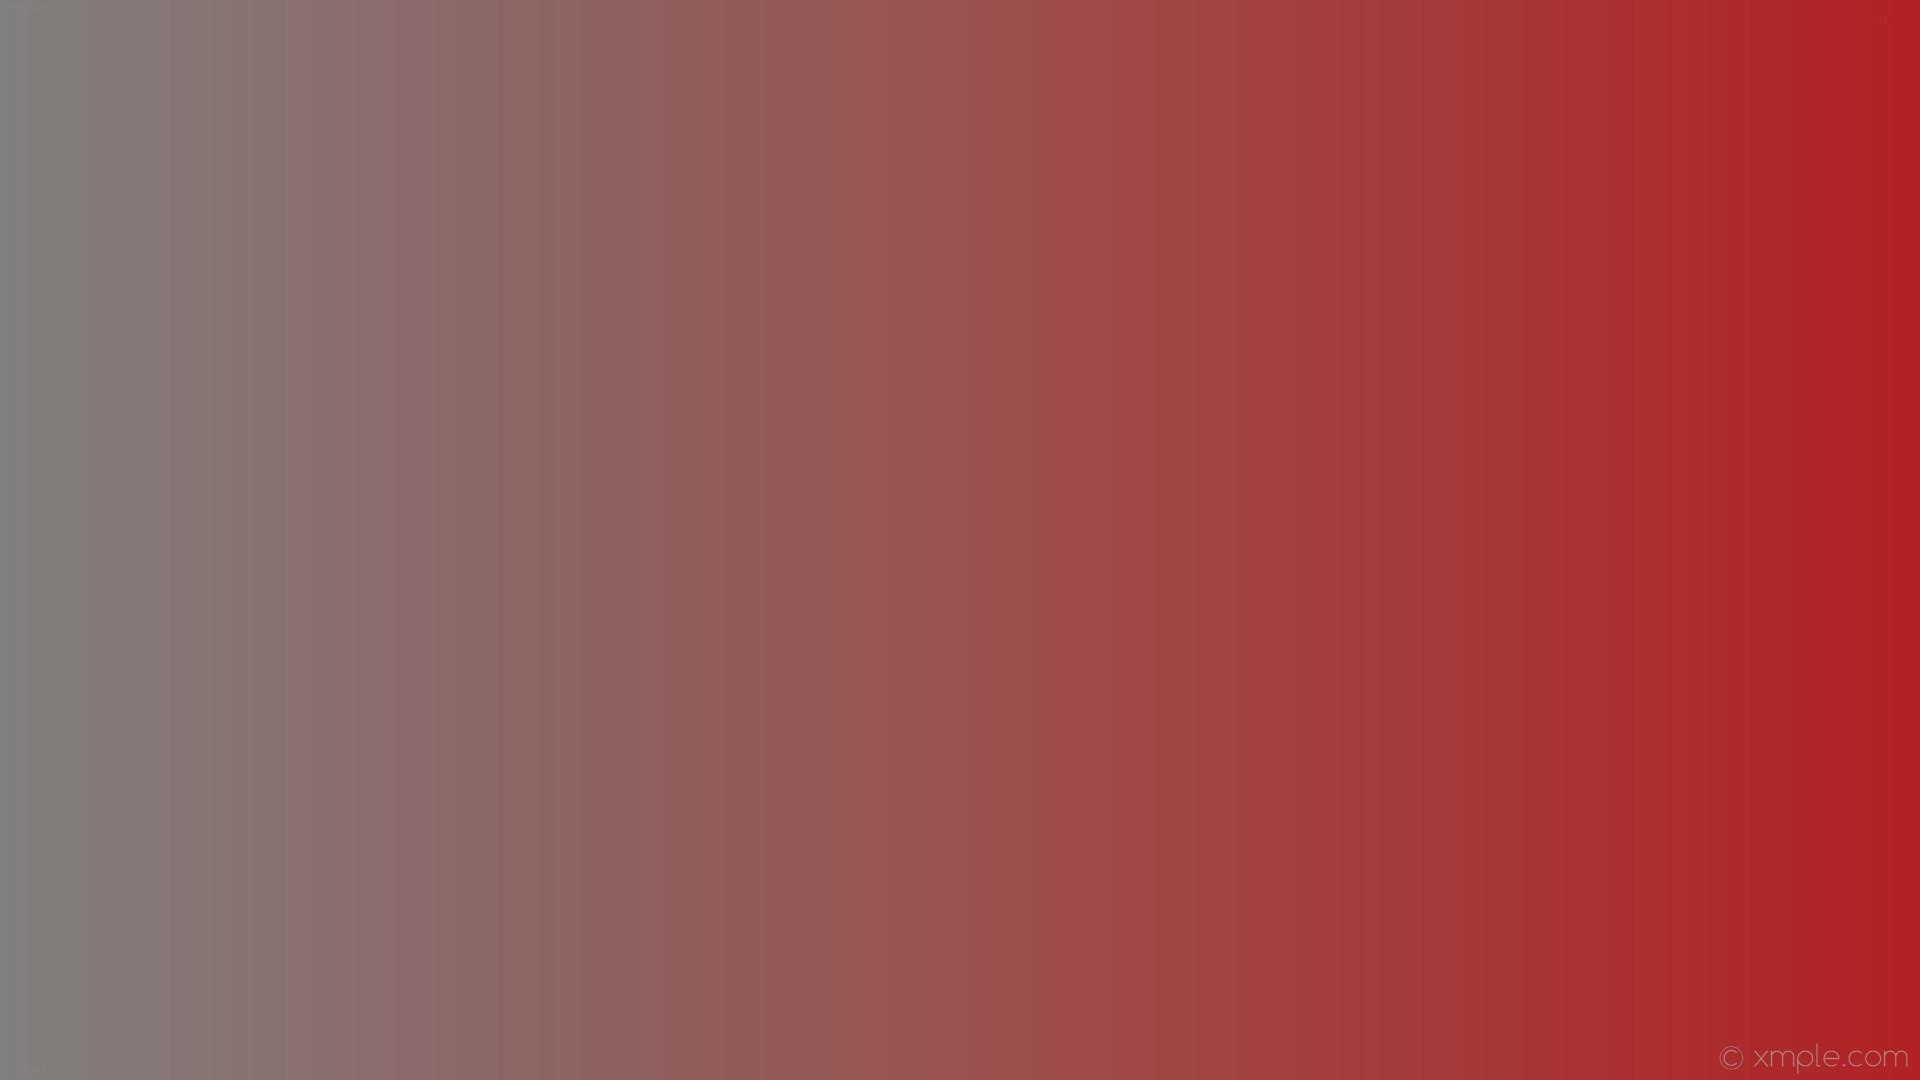 wallpaper gradient grey red linear gray fire brick #808080 #b22222 180°